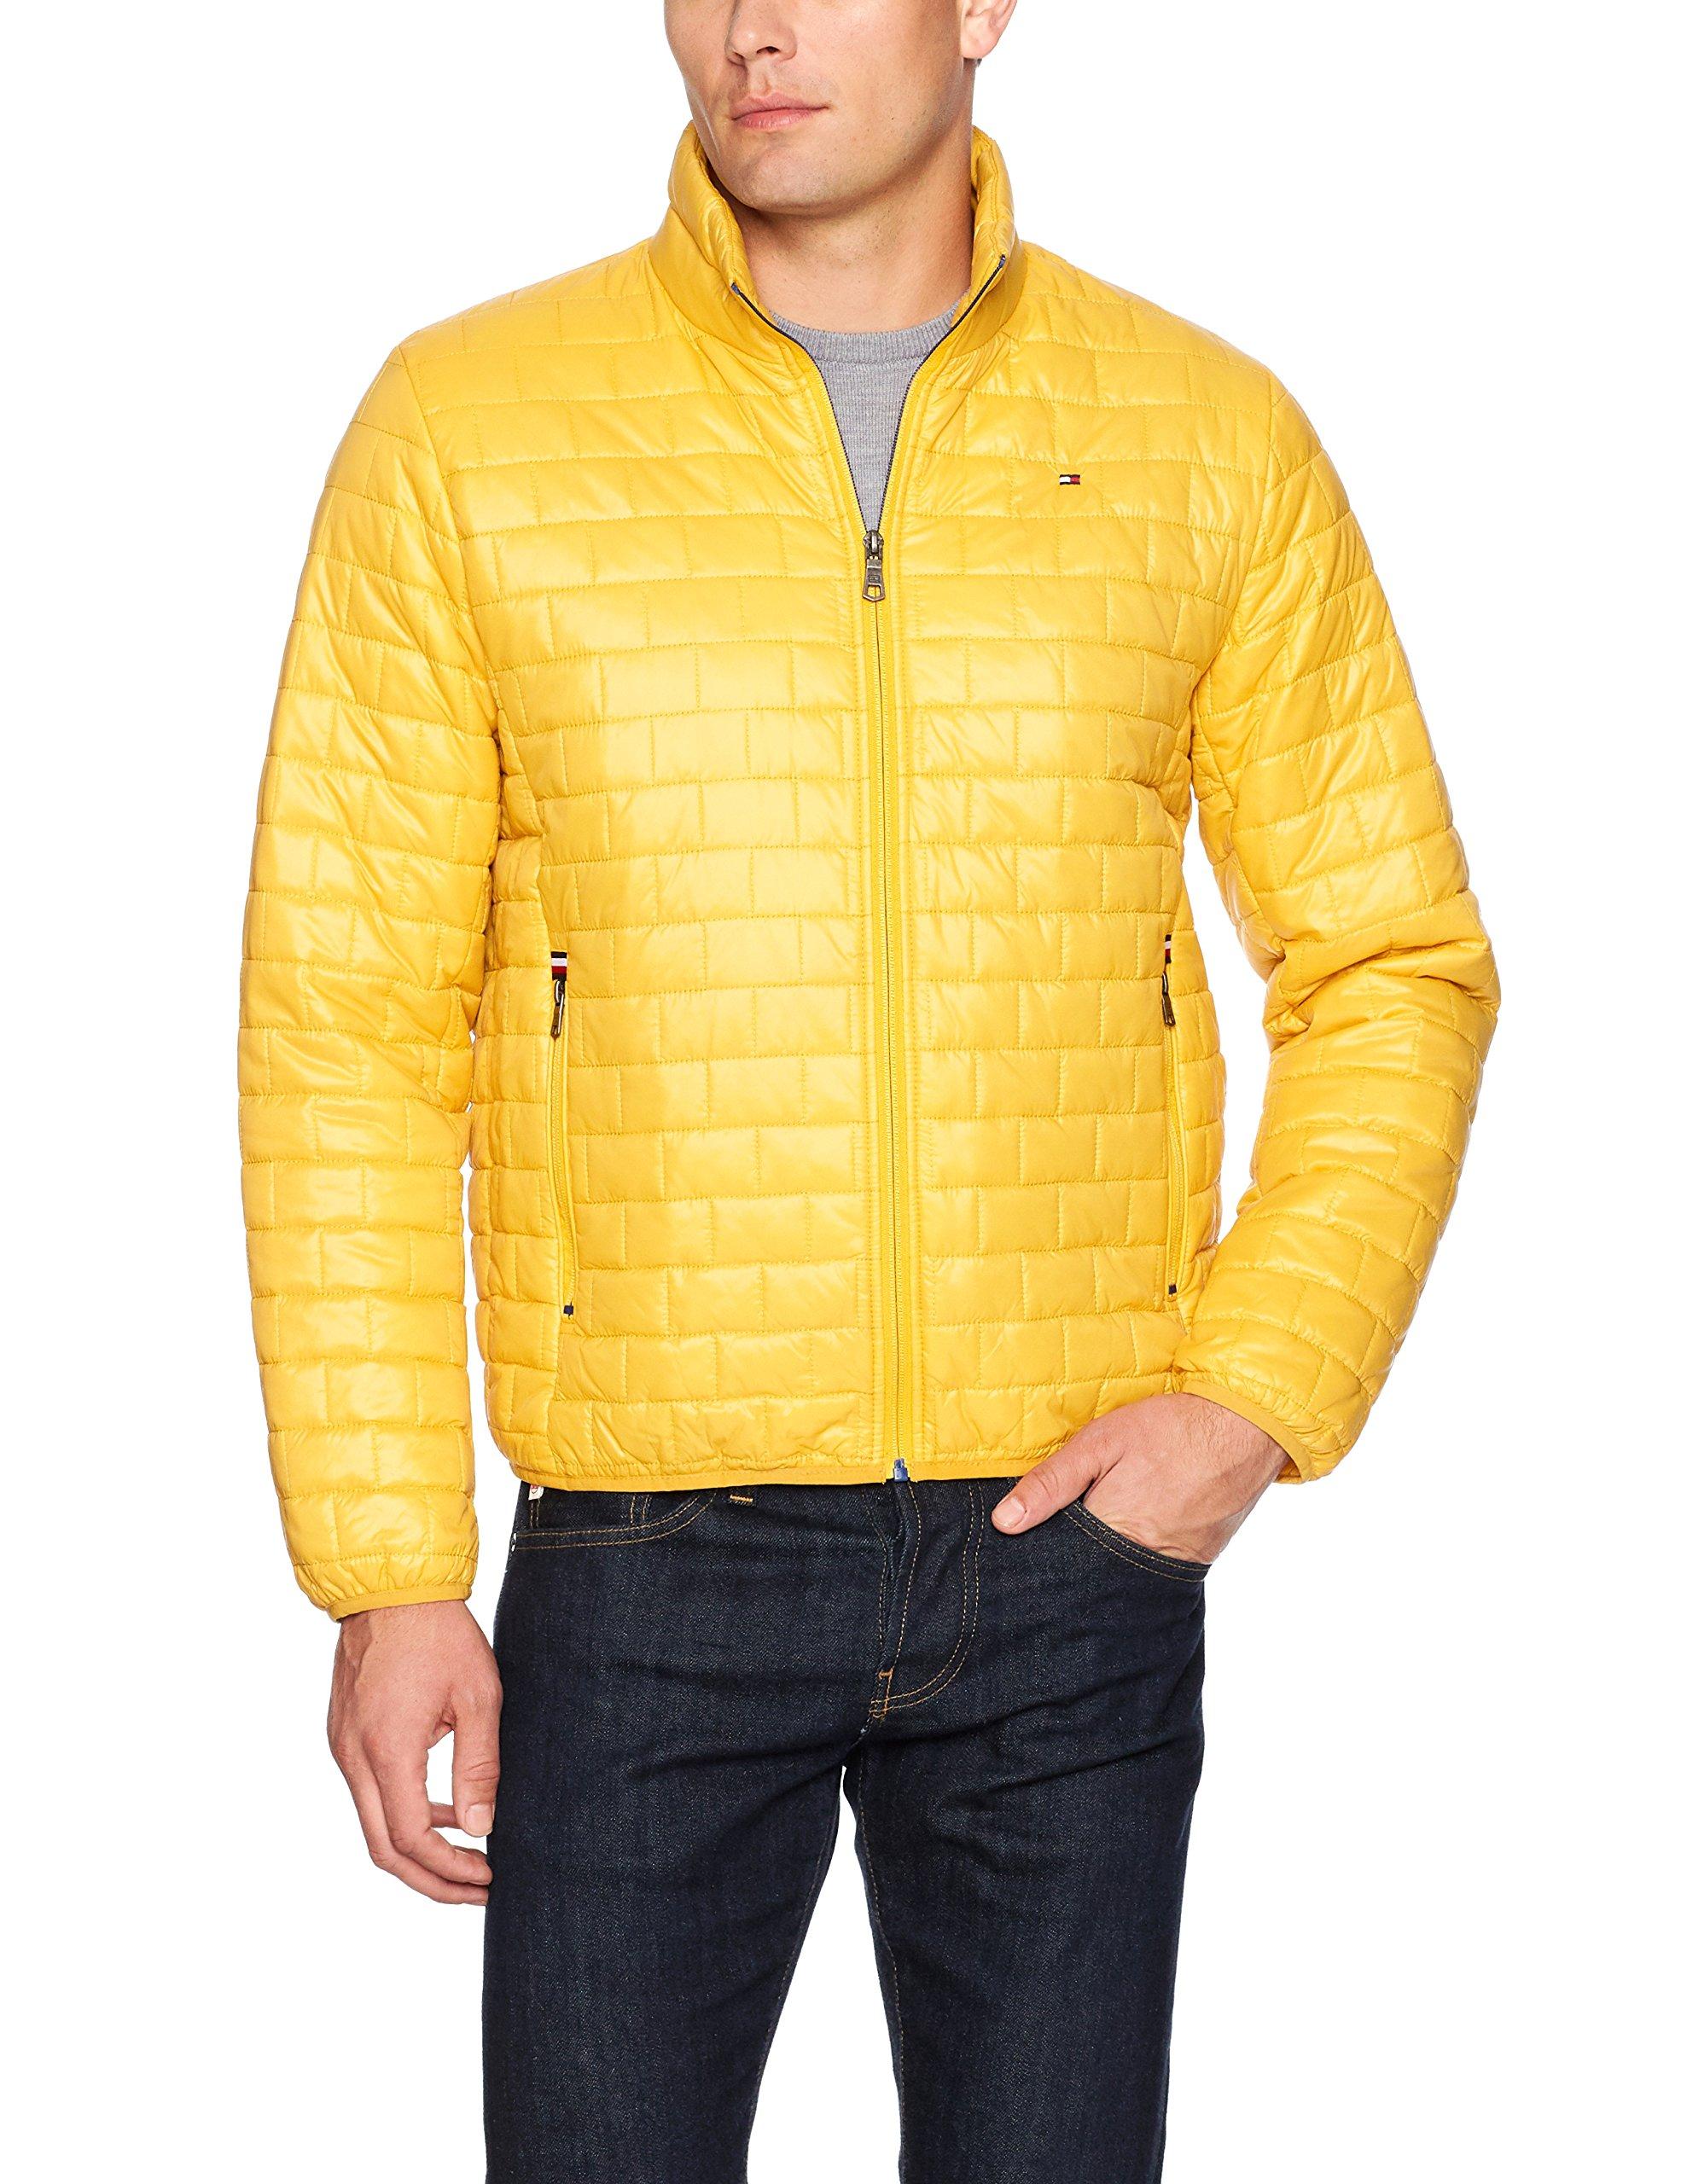 Tommy Hilfiger Men's Ultra Loft Sweaterweight Quilted Packable Jacket, Yellow, Medium